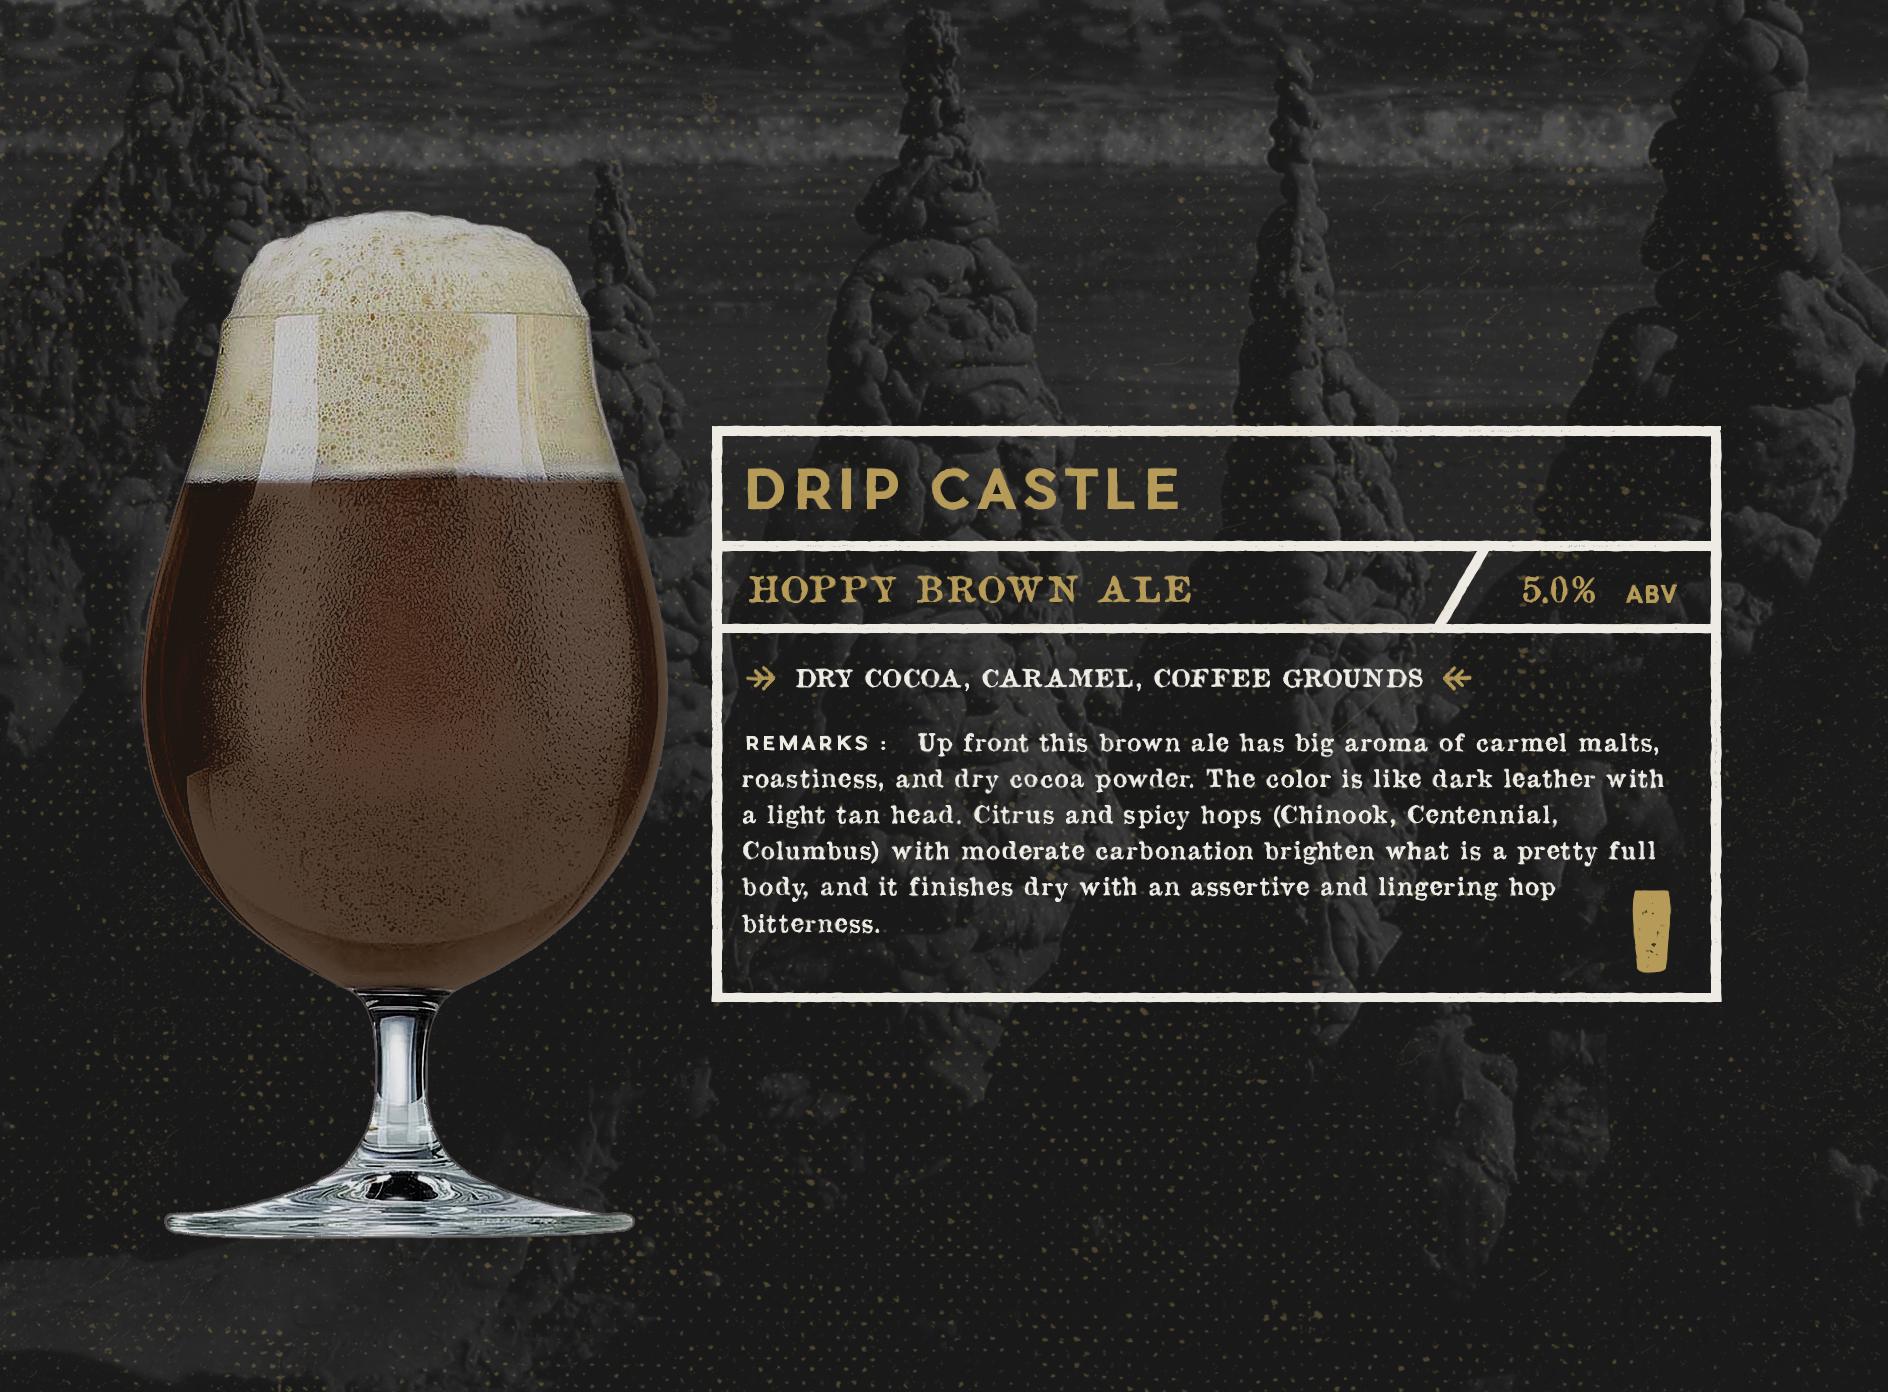 DRIP CASTLE